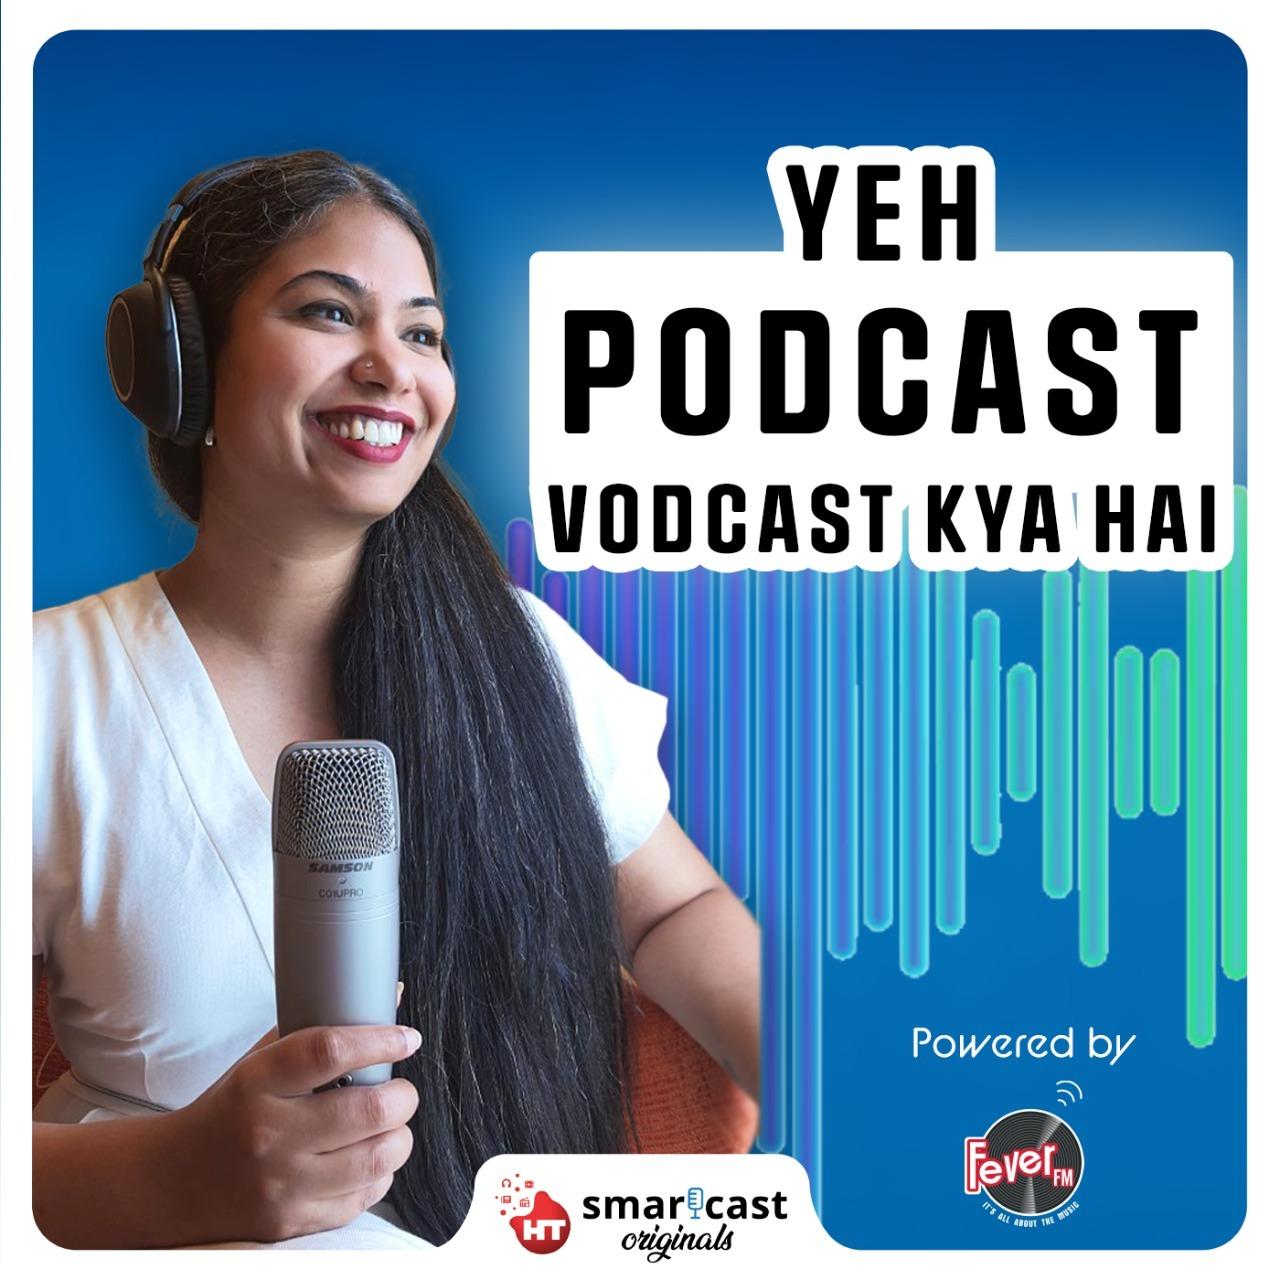 Yeh Podcast Vodcast Kya Hai